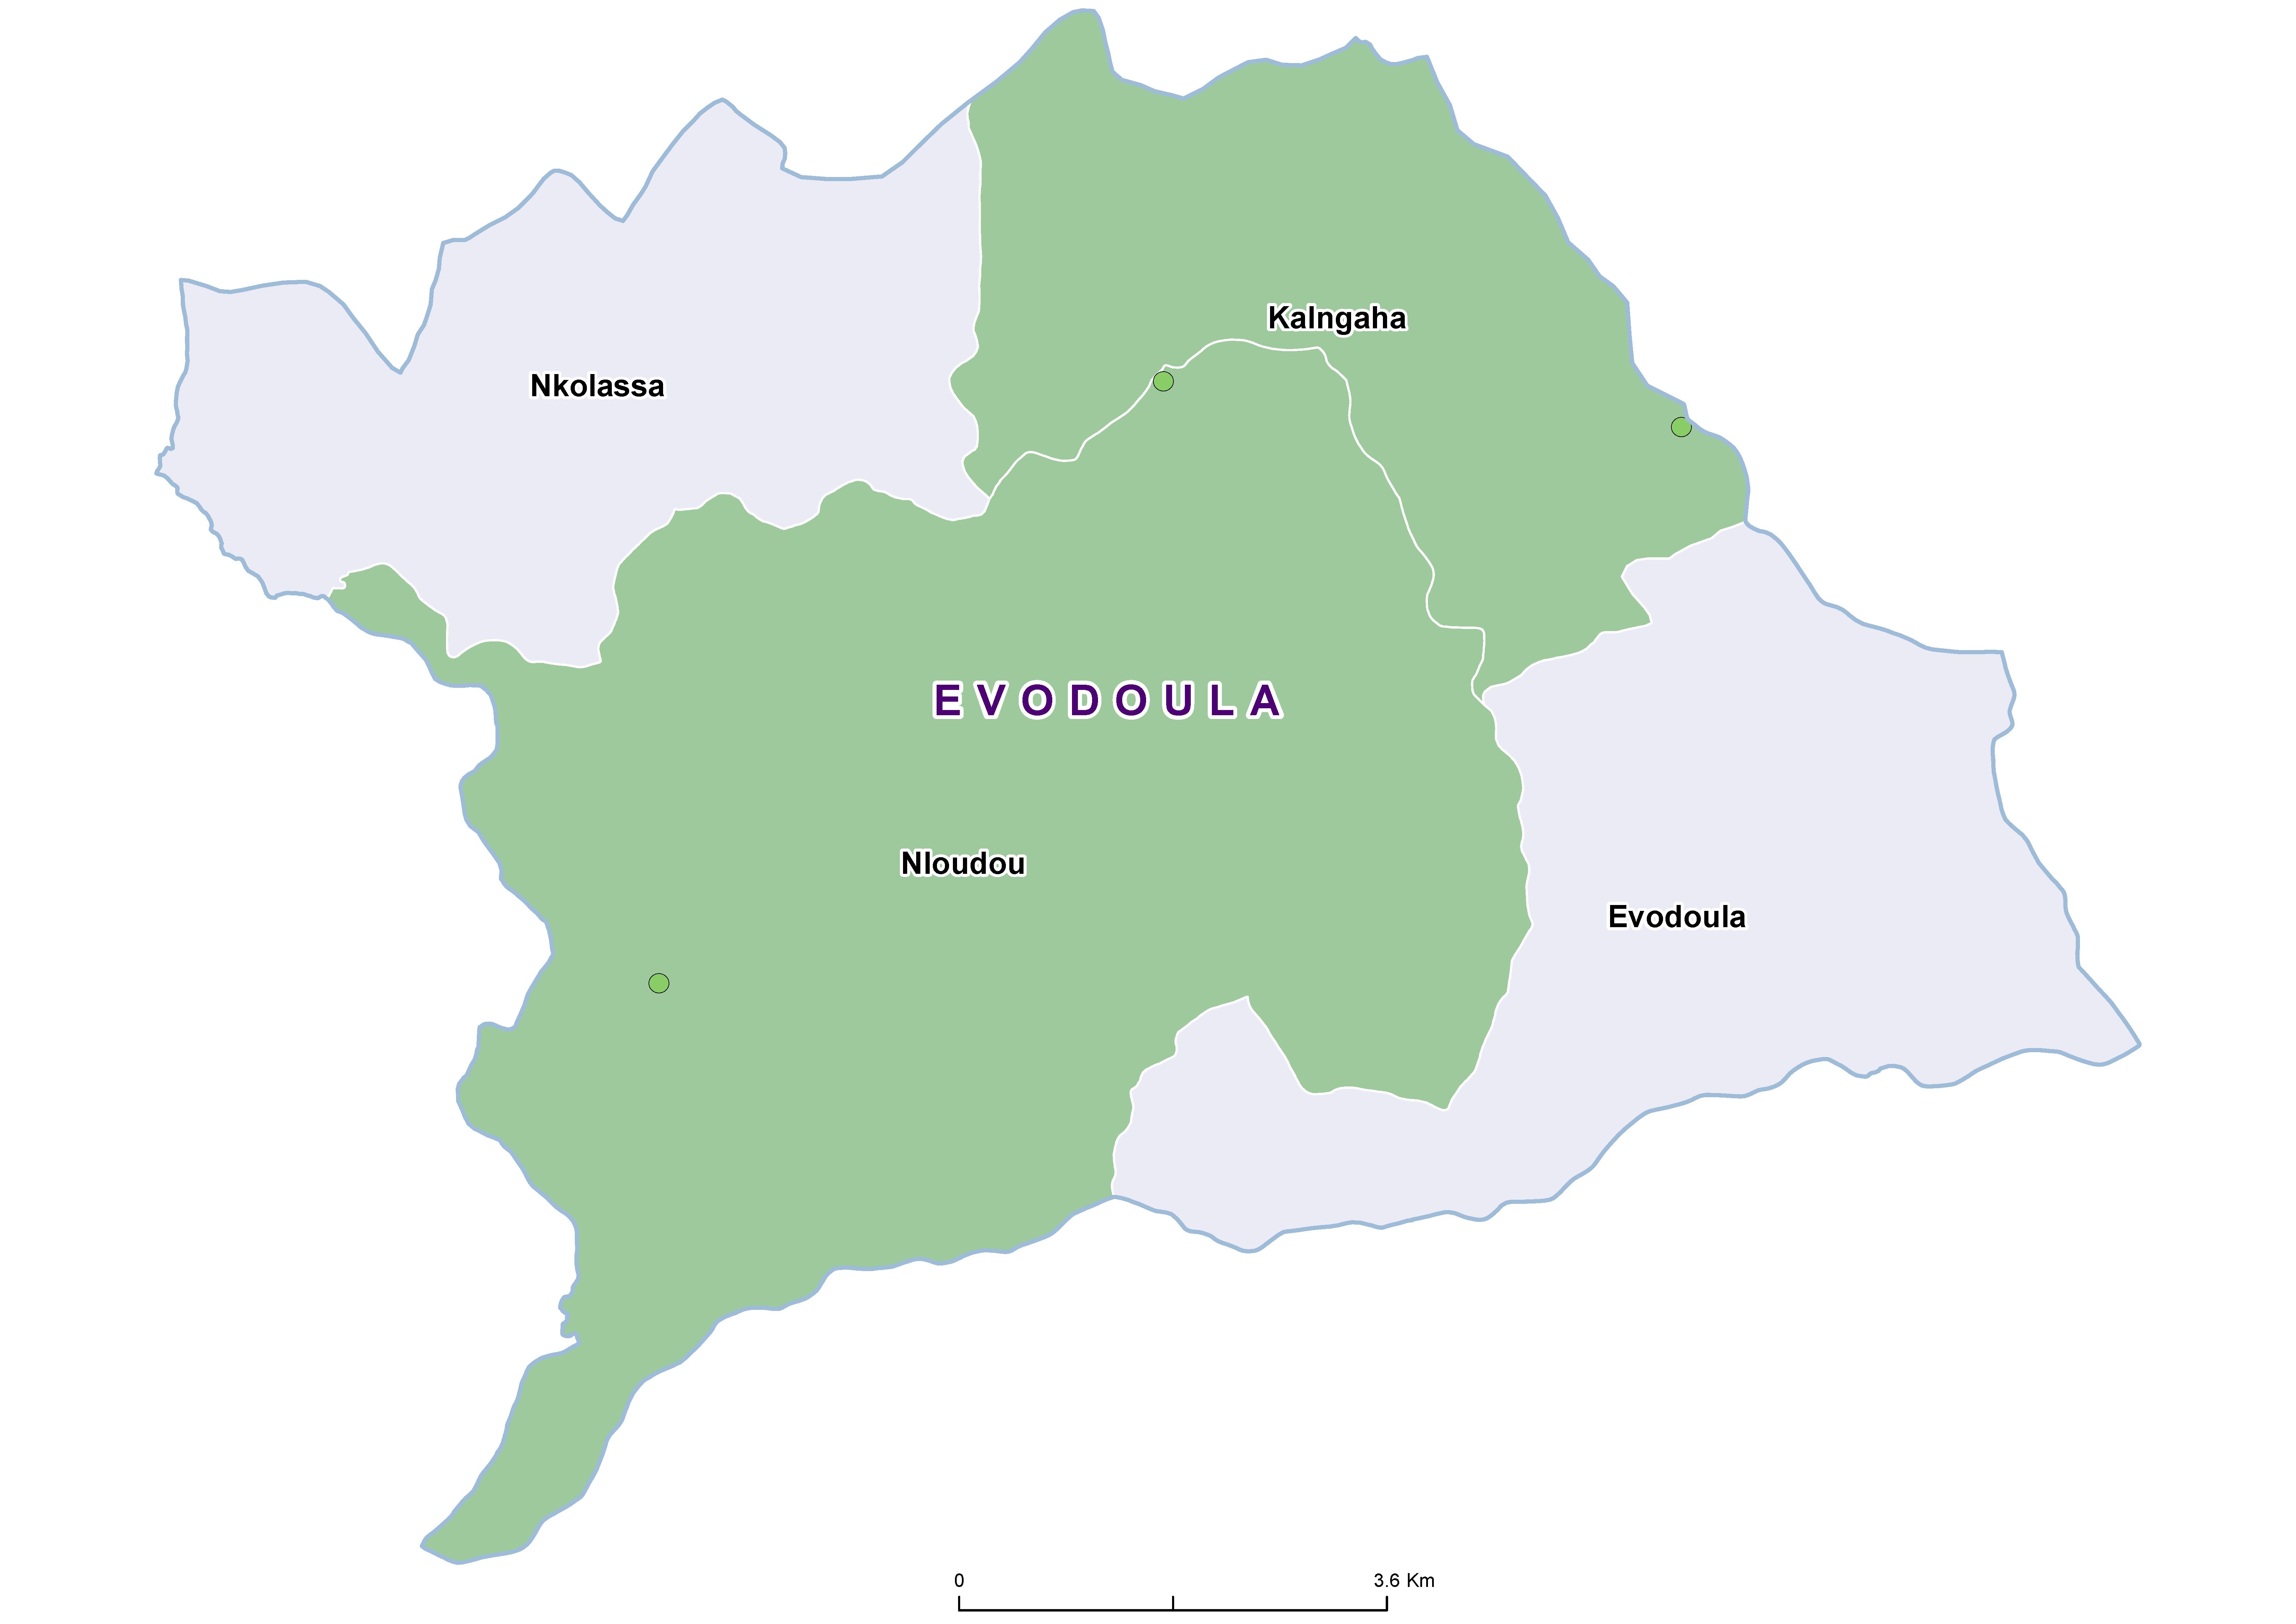 Evodoula SCH 20100001